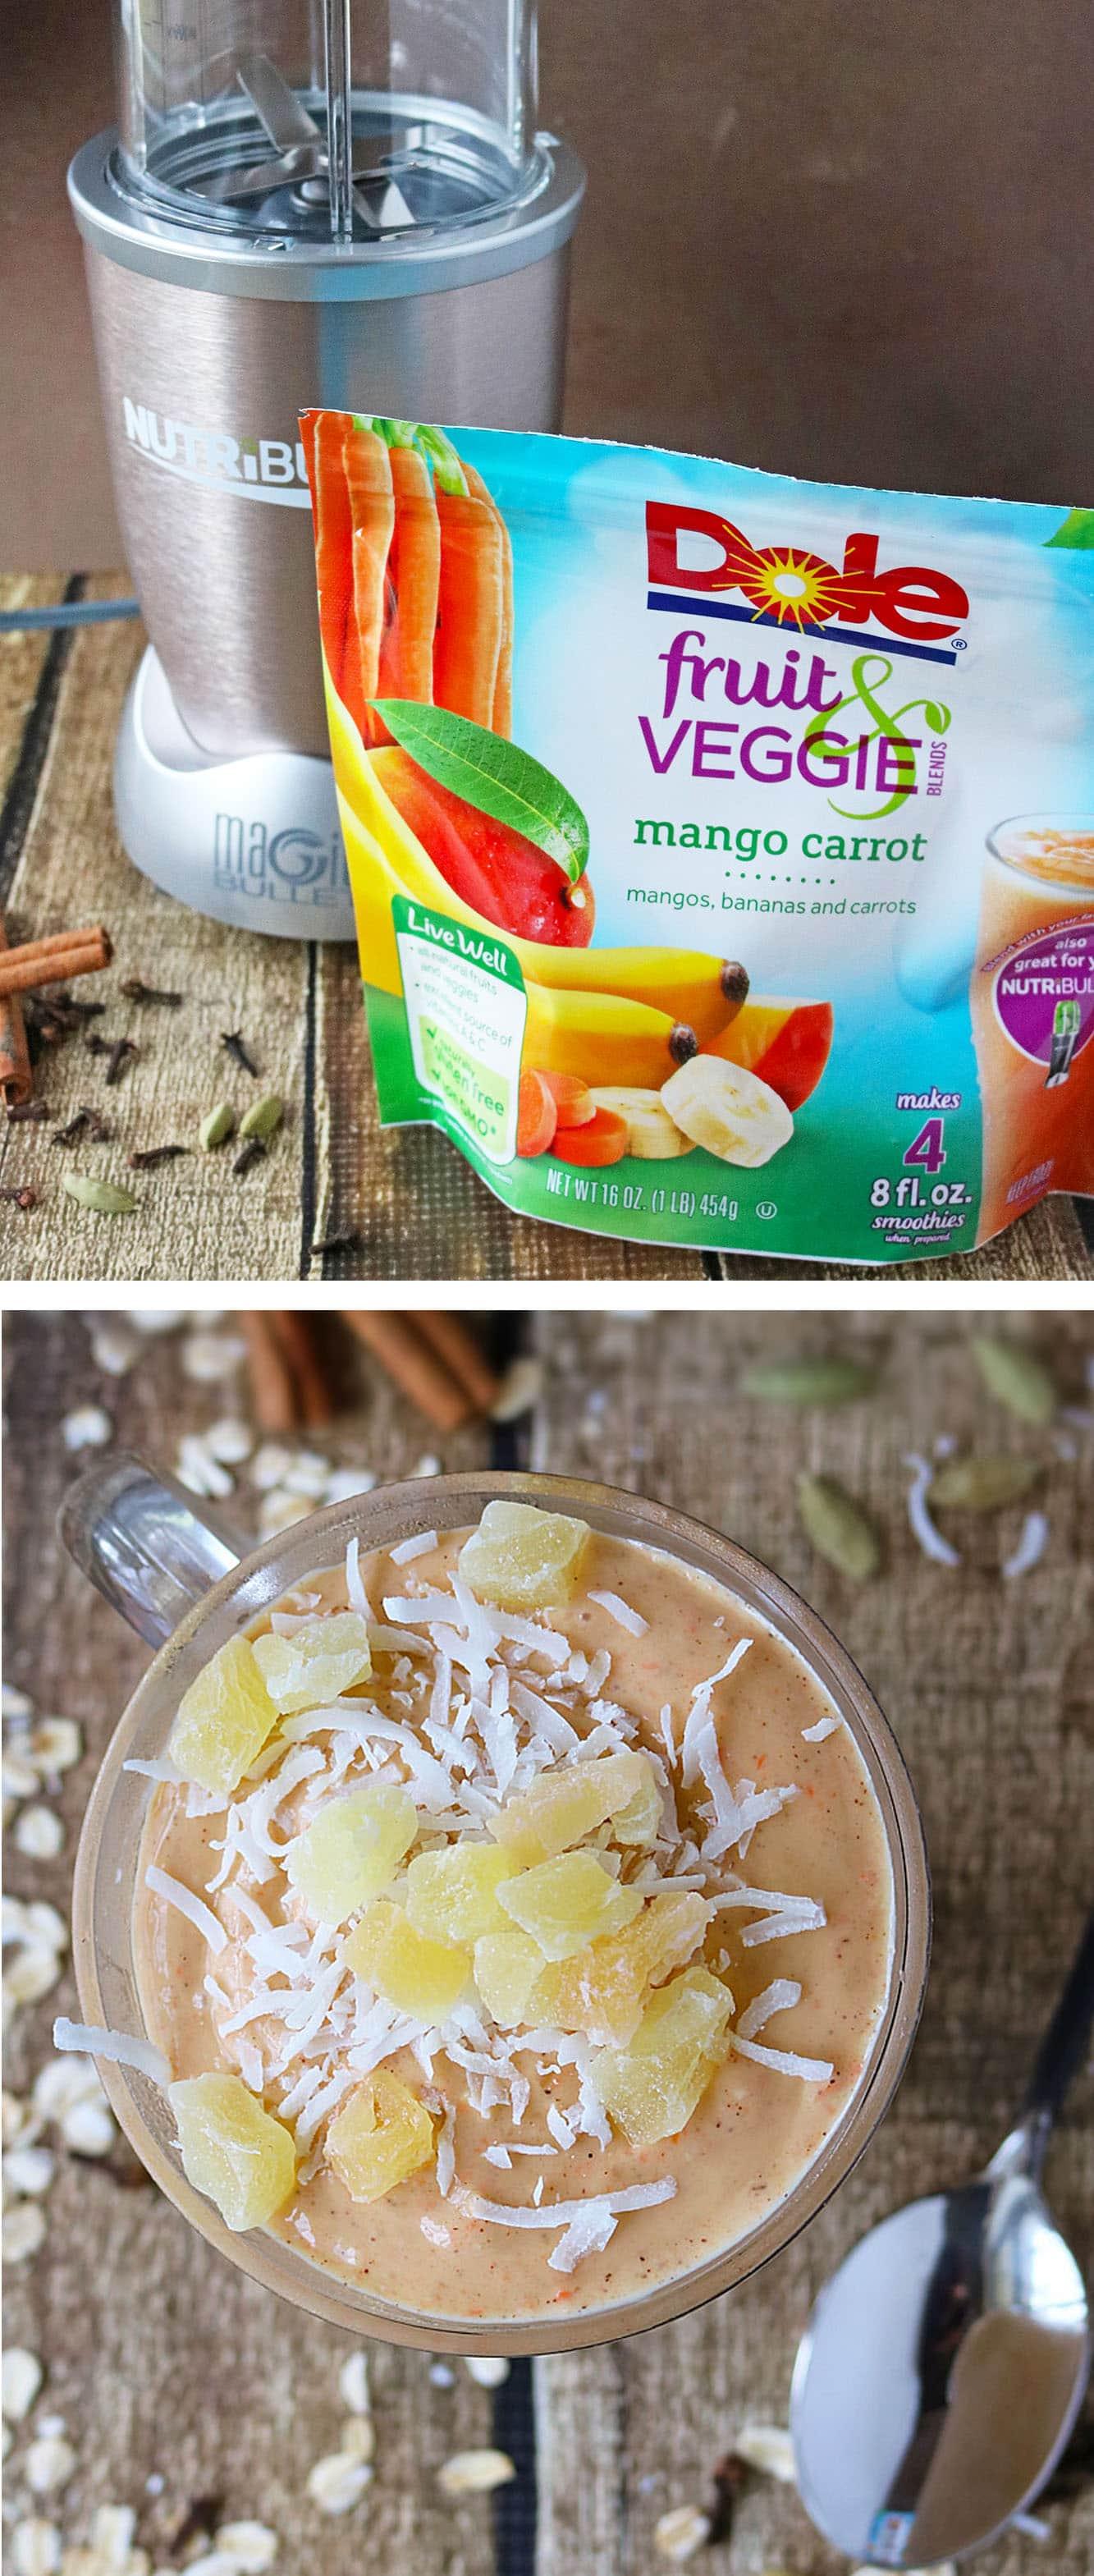 Dairy Free Dole Mango Carrot Smoothie #BestBlendsForever